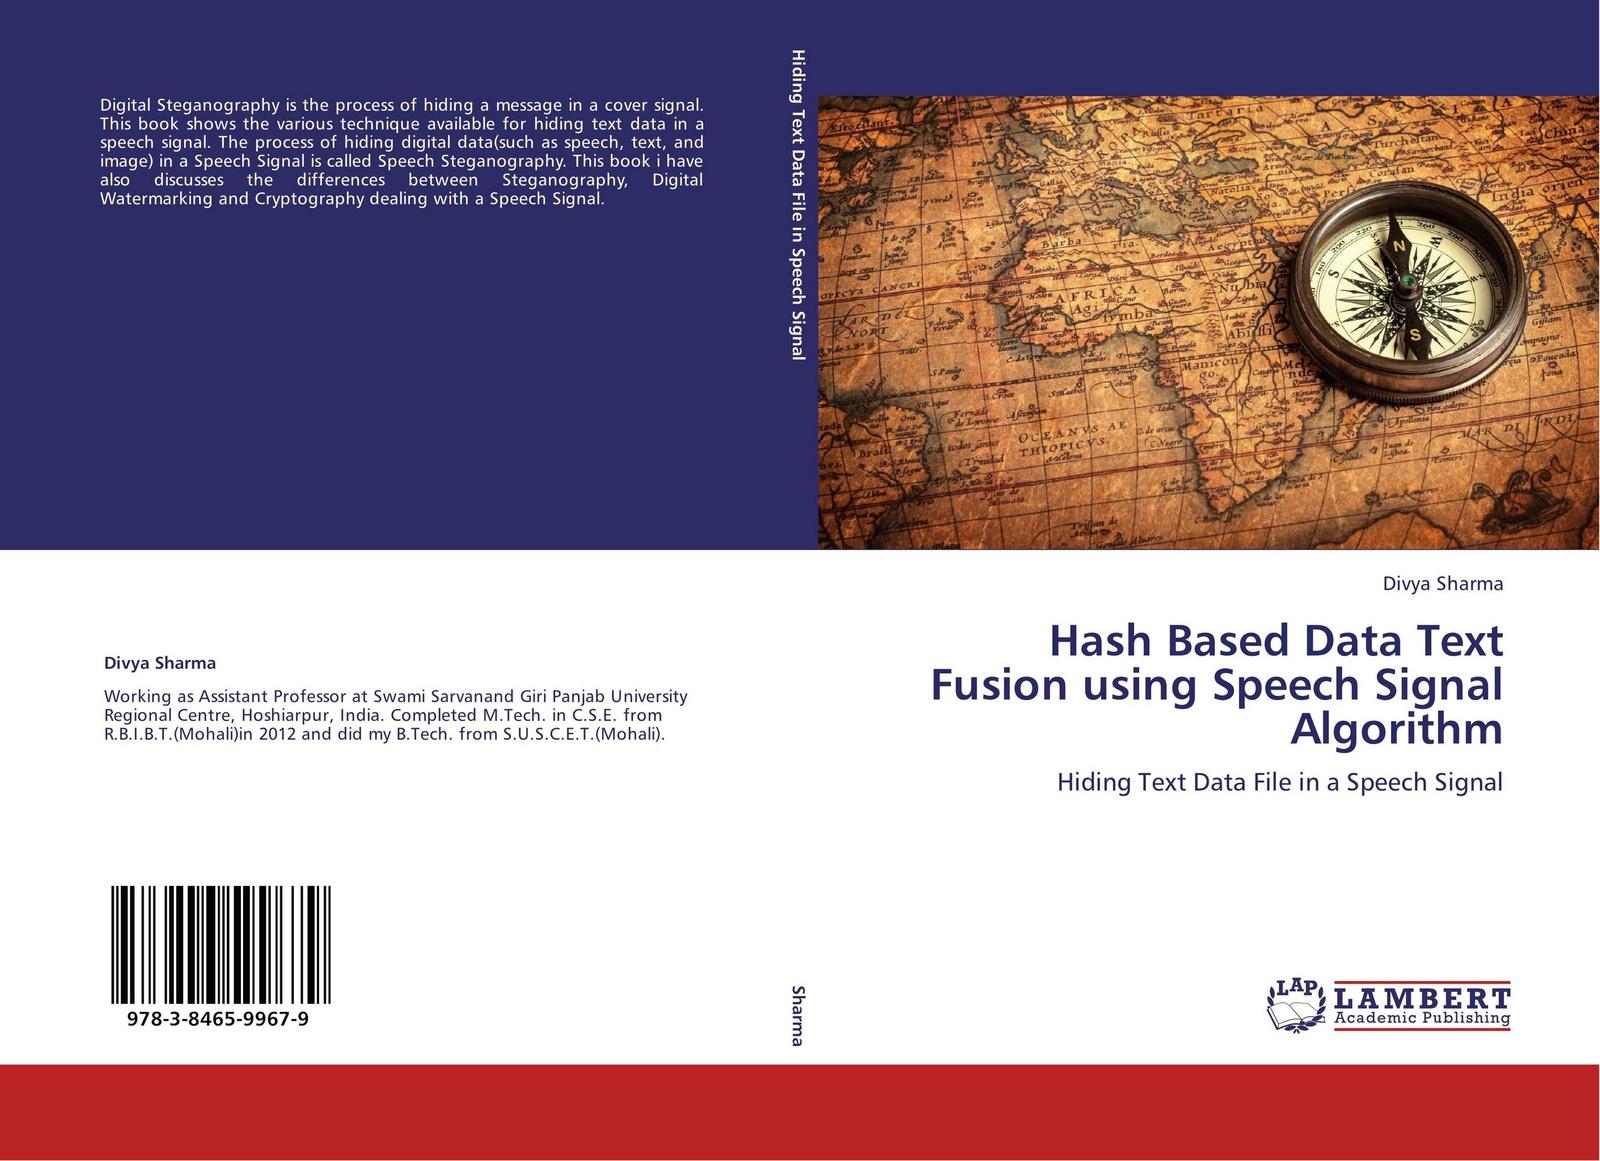 Divya Sharma Hash Based Data Text Fusion using Speech Signal Algorithm